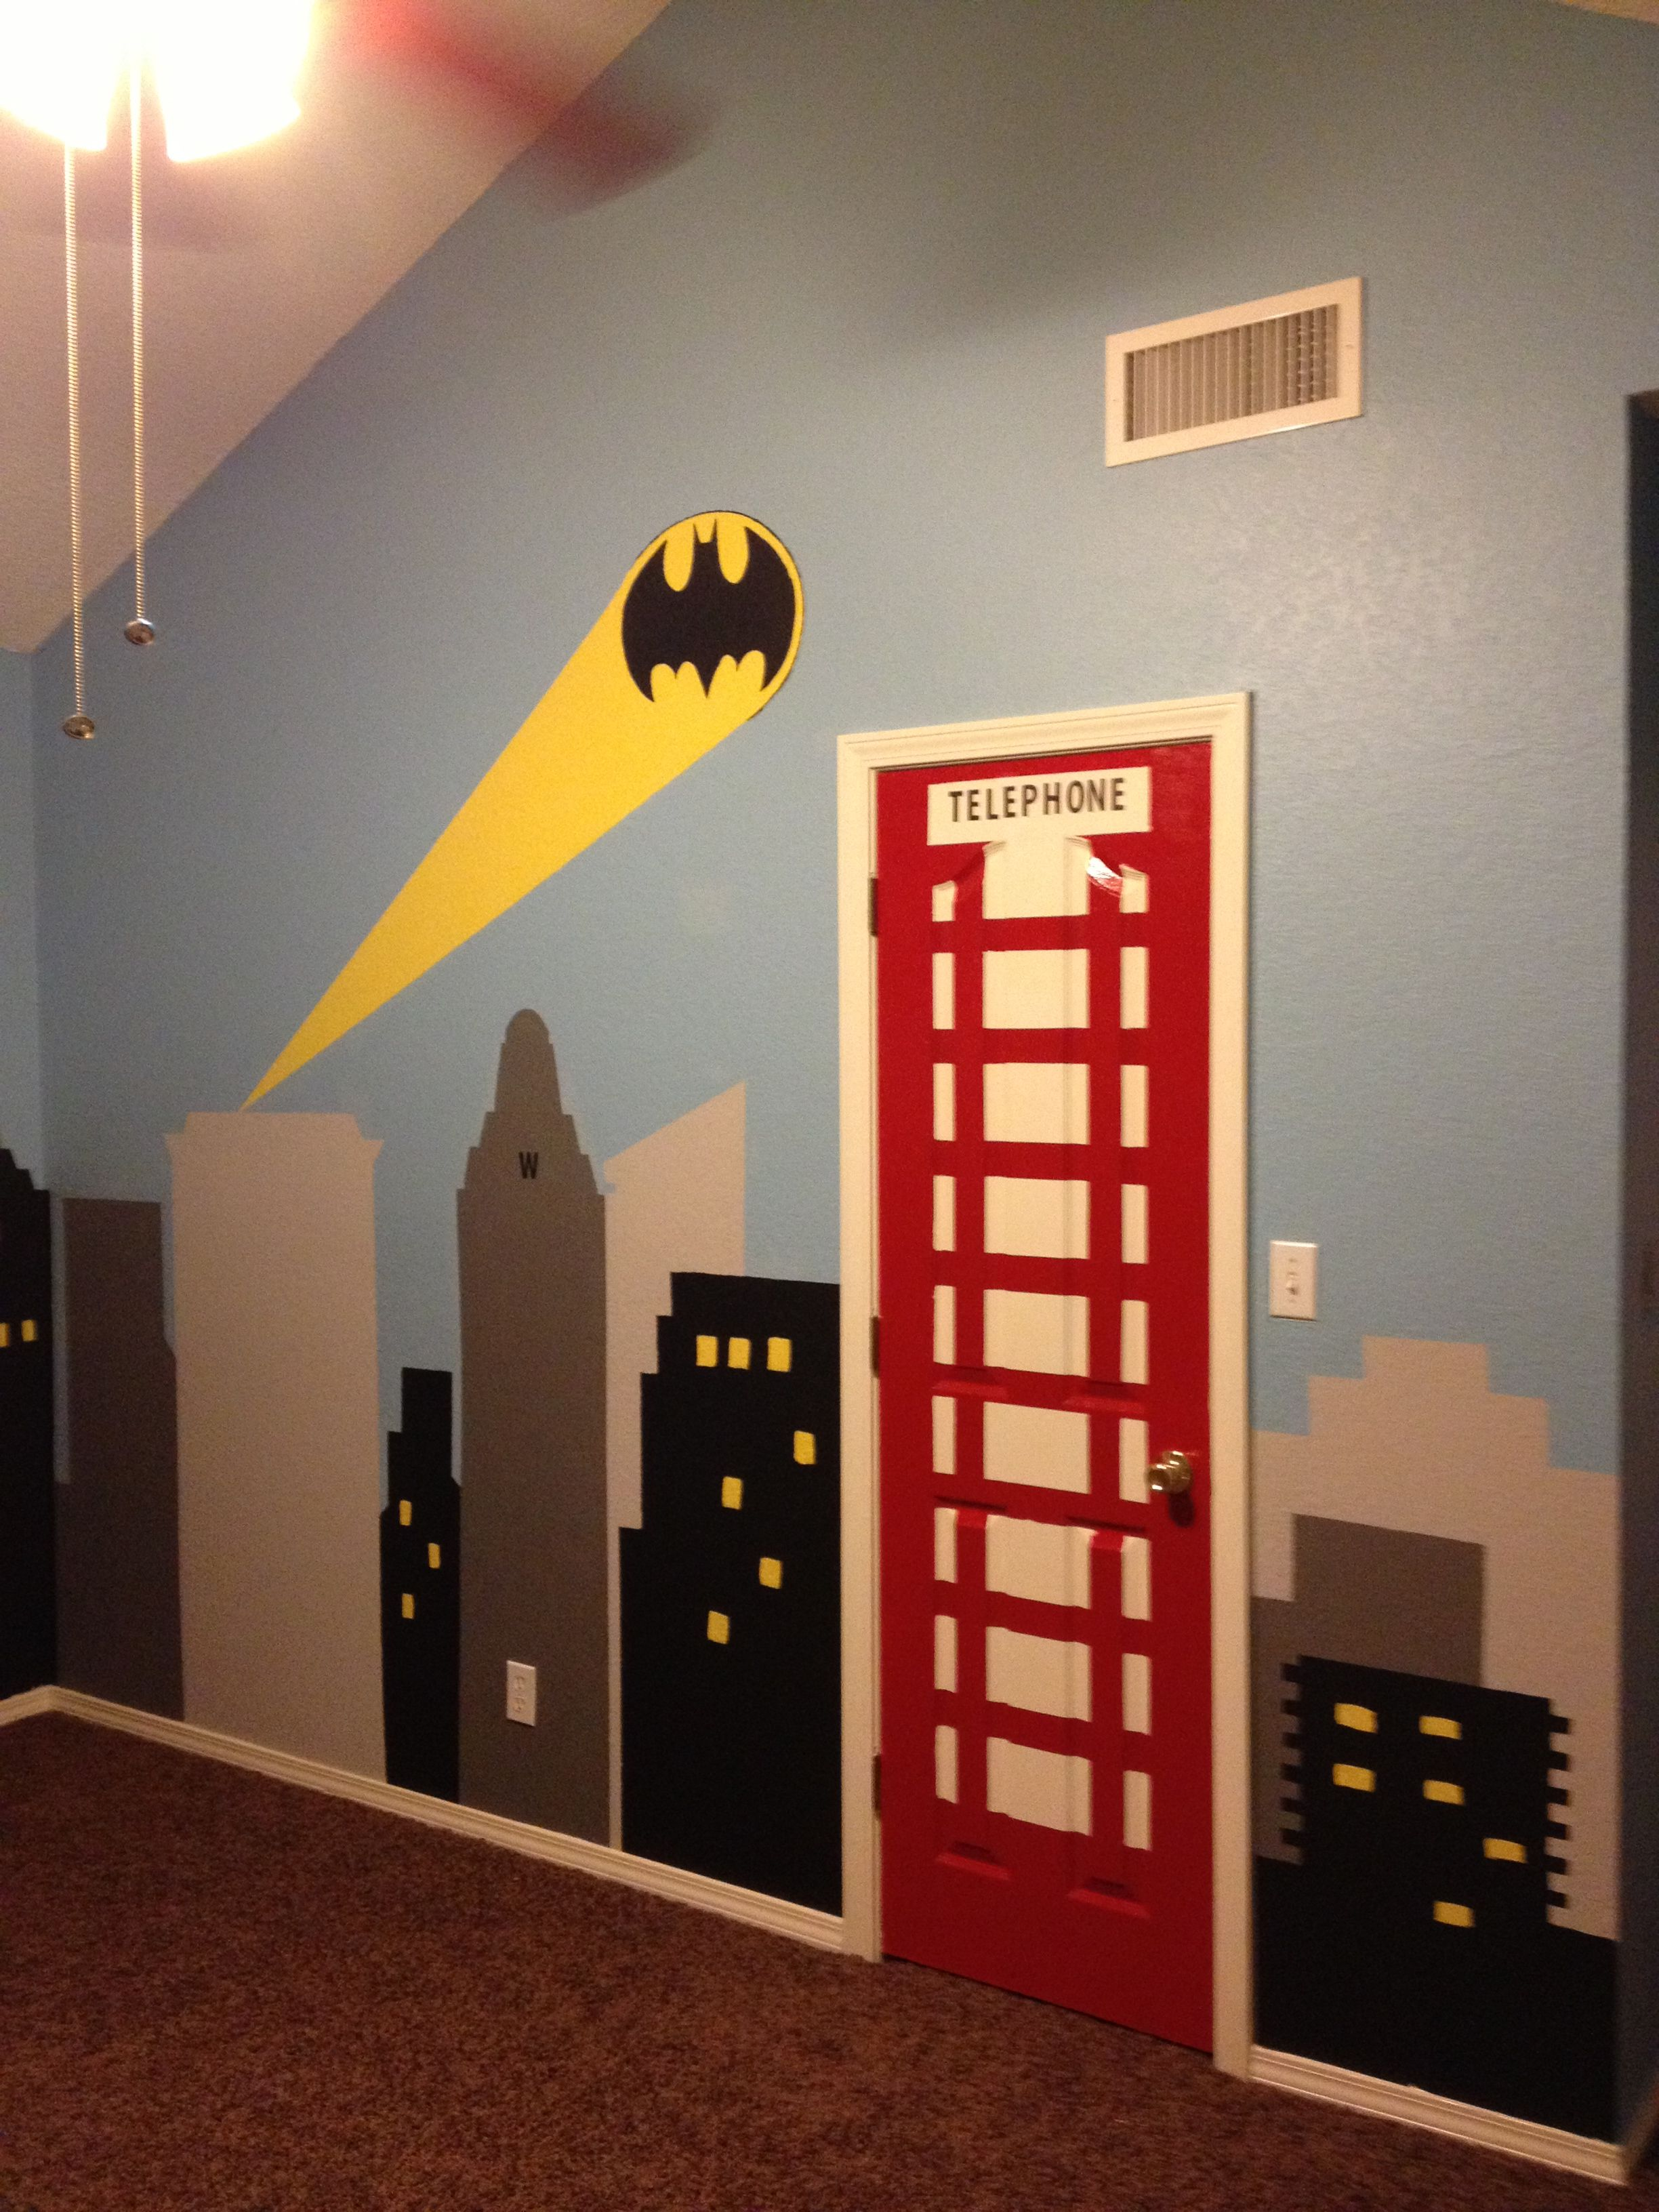 Superhero Room Design: My Sons New Superhero Room With Batman Light Signal